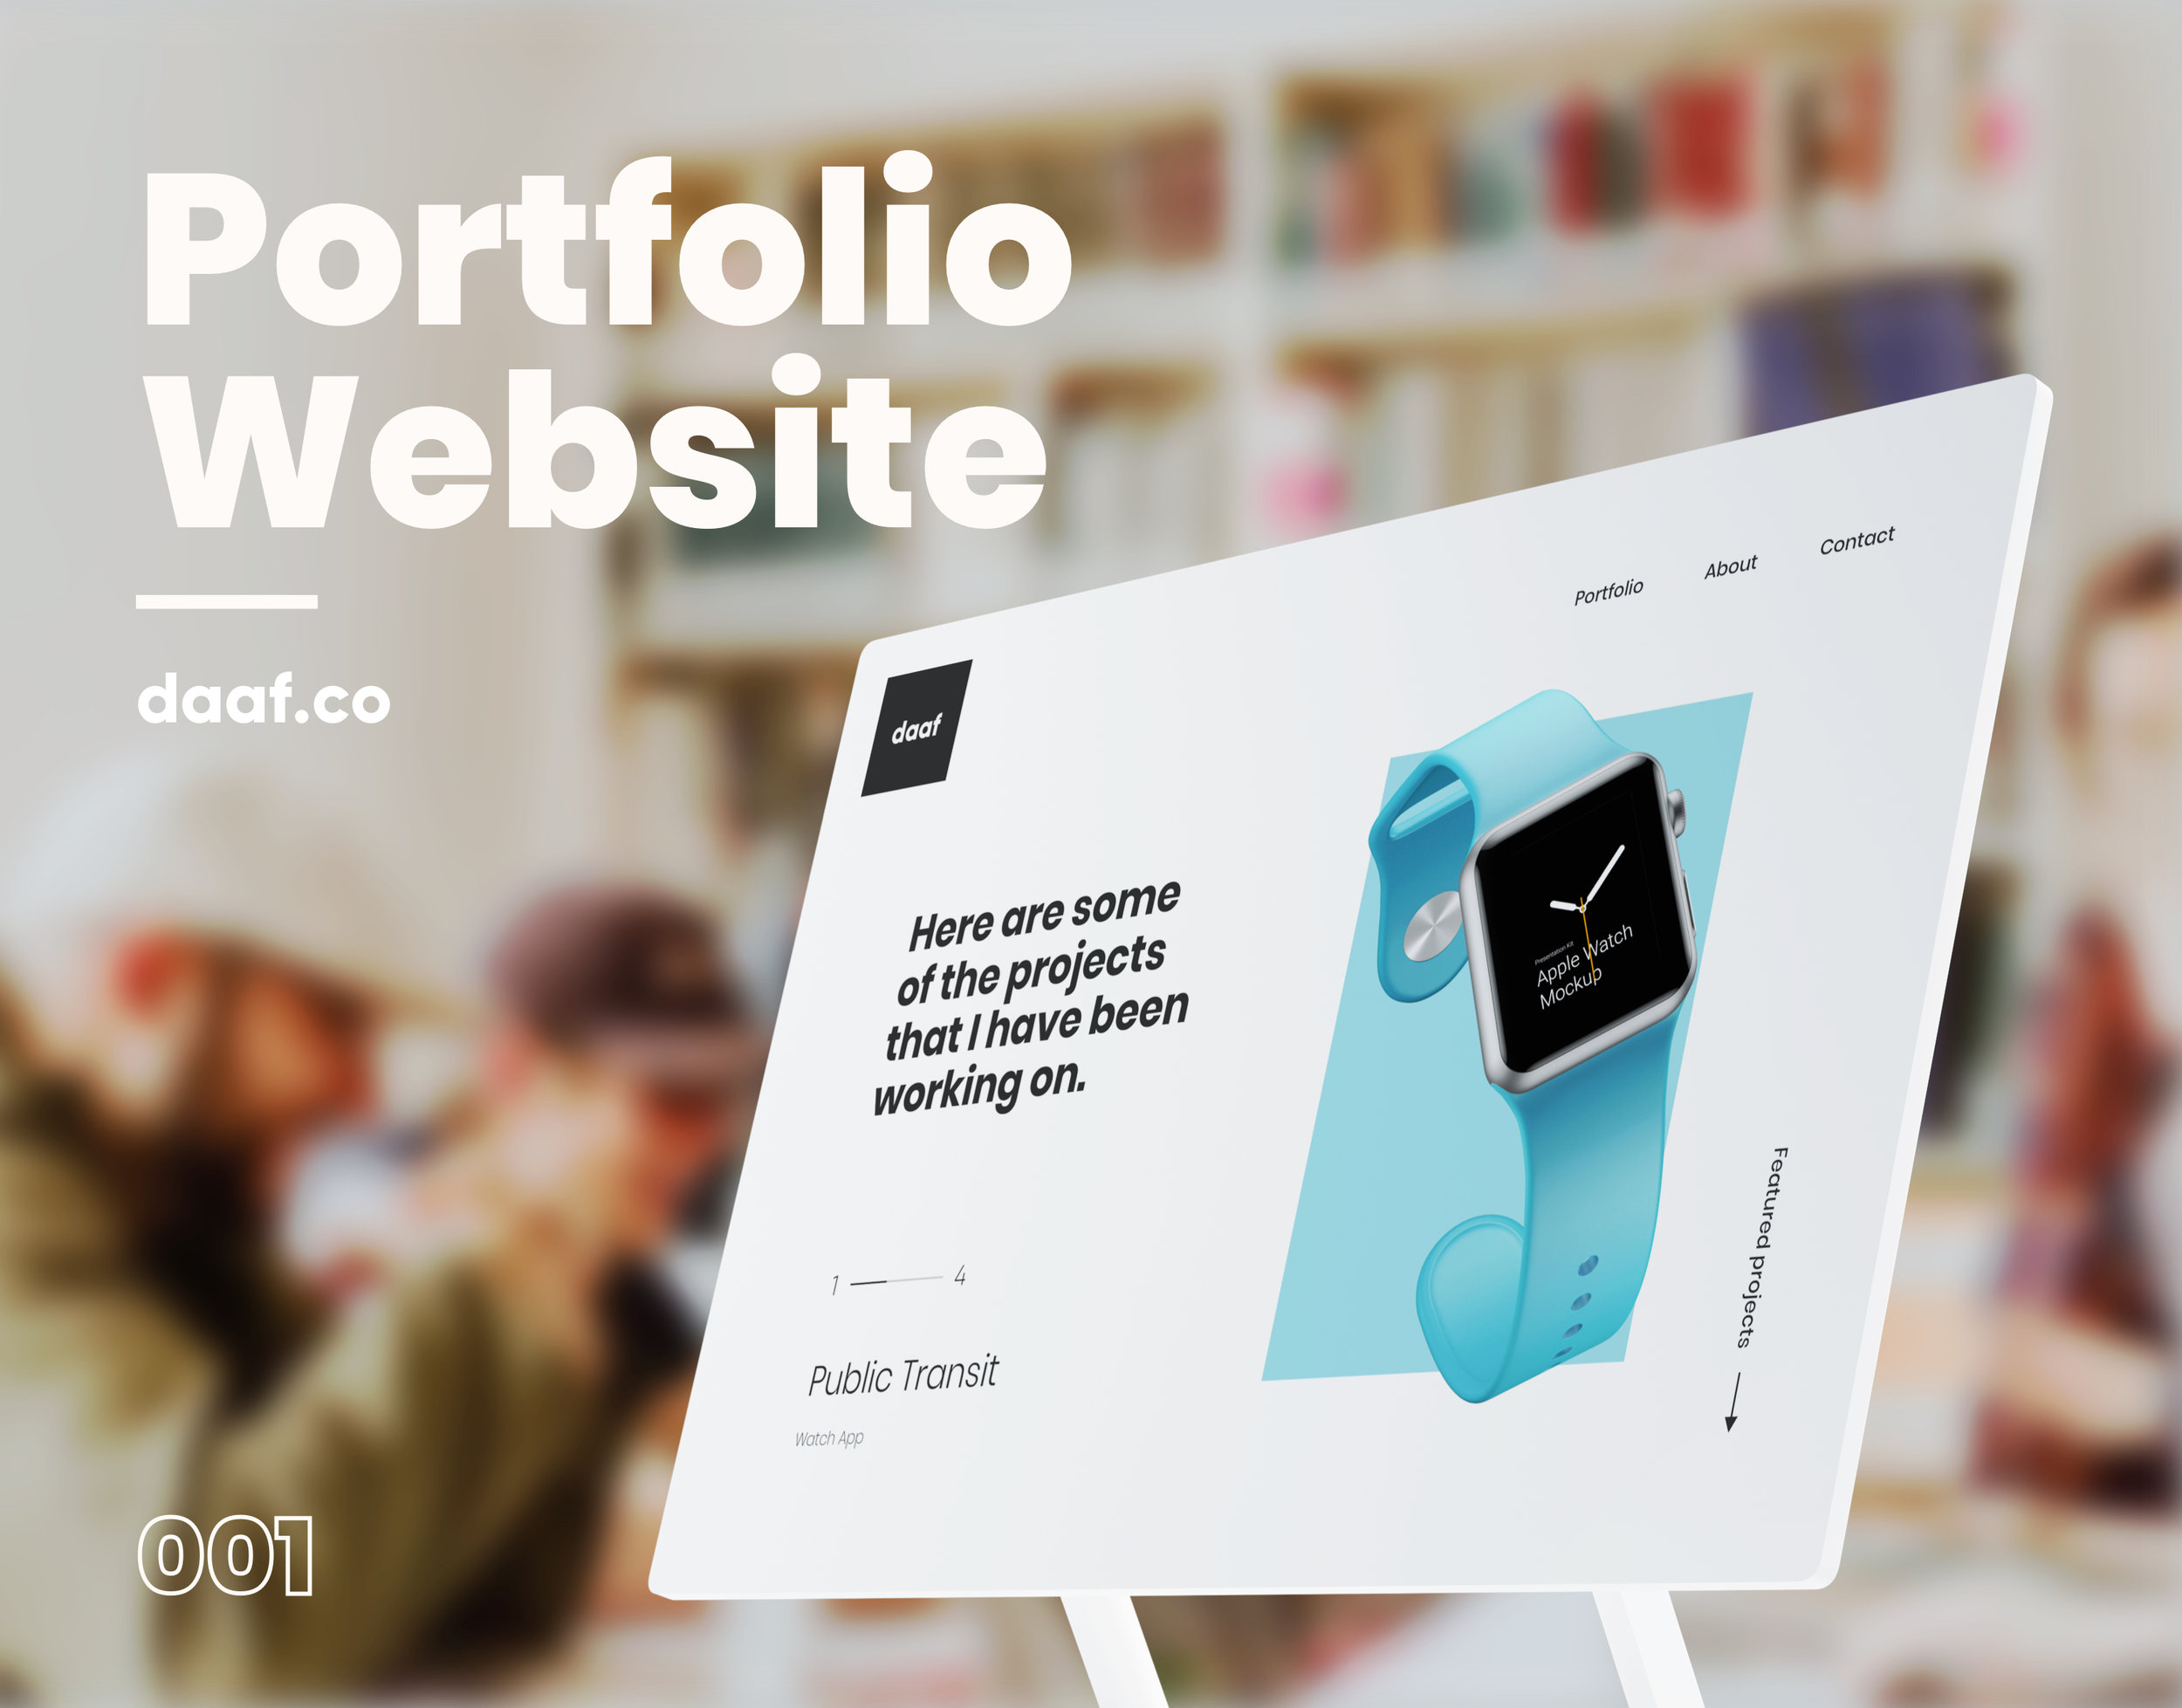 Portfolio website - Responsive Website